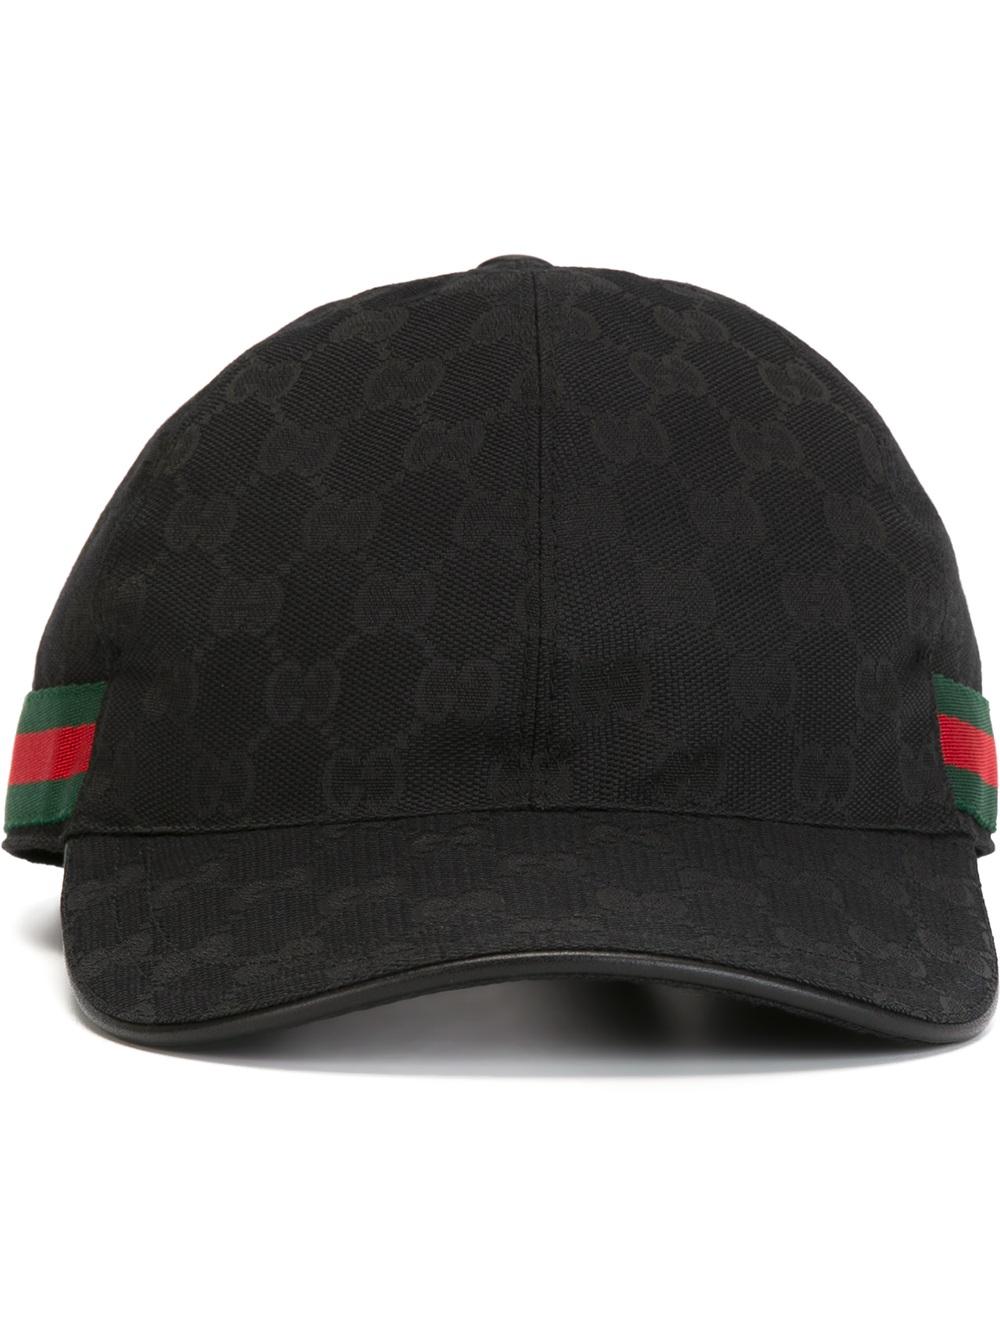 Gucci Original Gg Canvas Baseball Hat for Men - Lyst 3337ac586ab